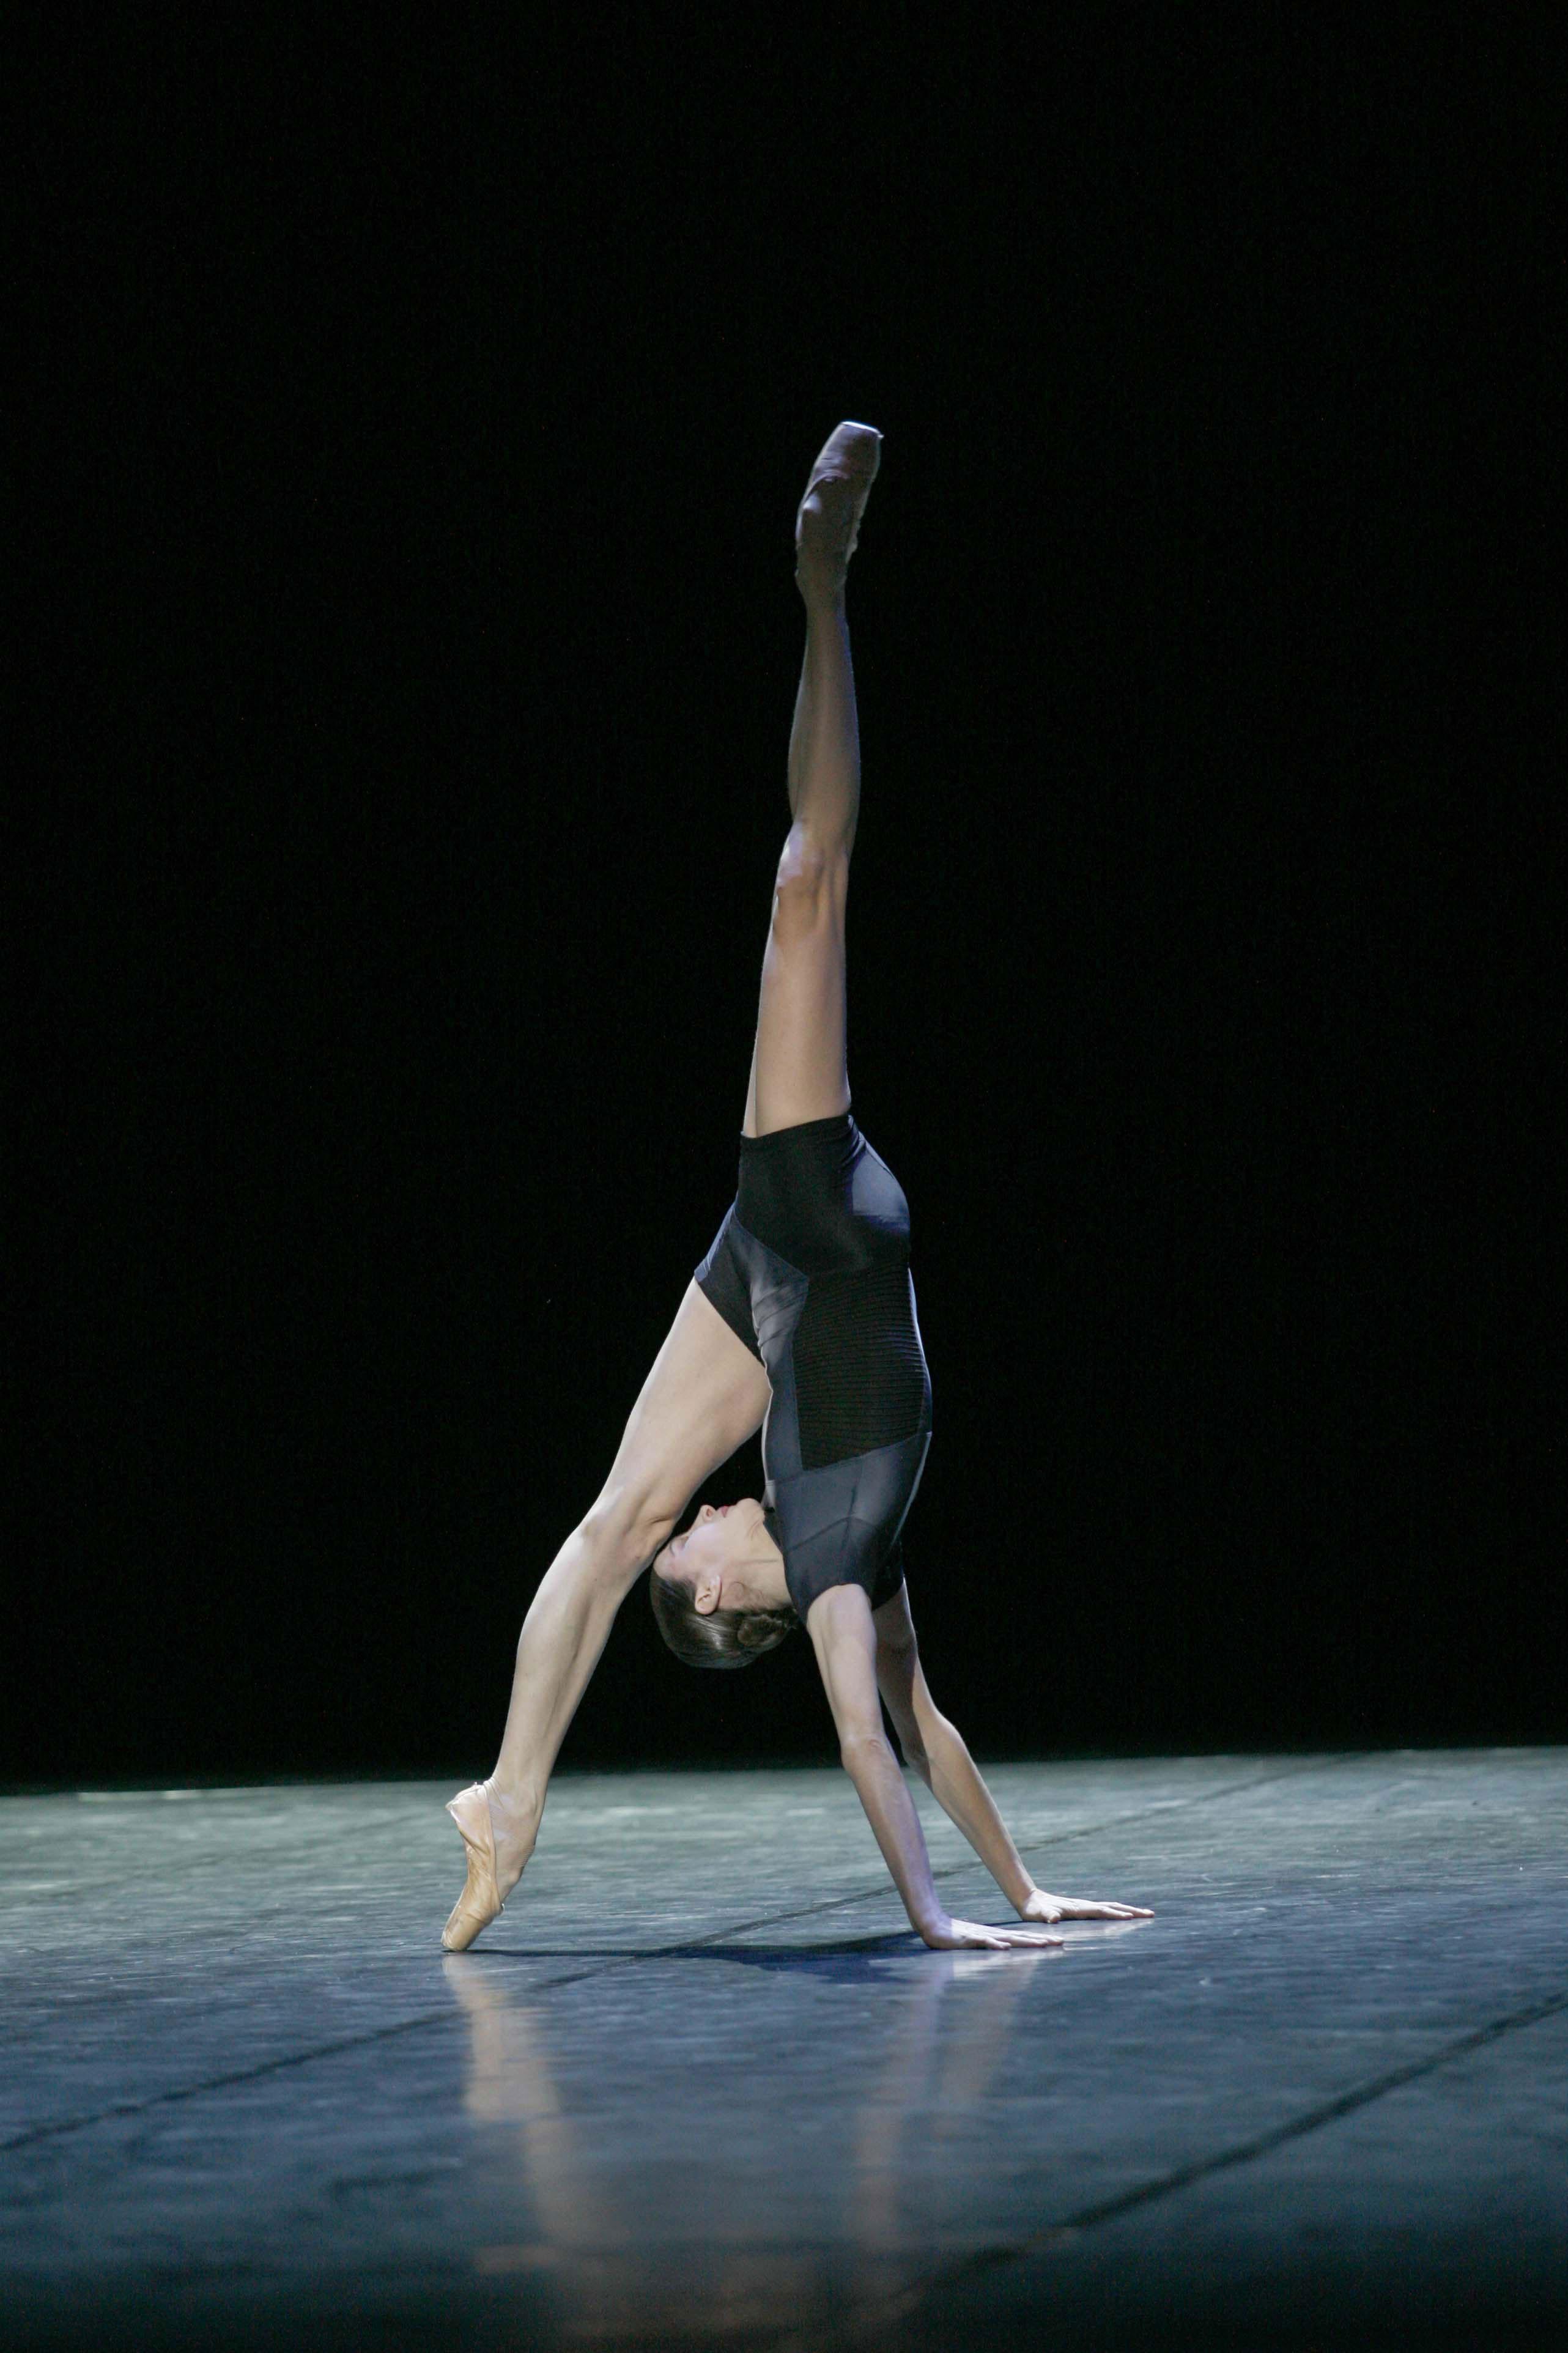 La danse das ballett der paiser oper for Bild ballerina